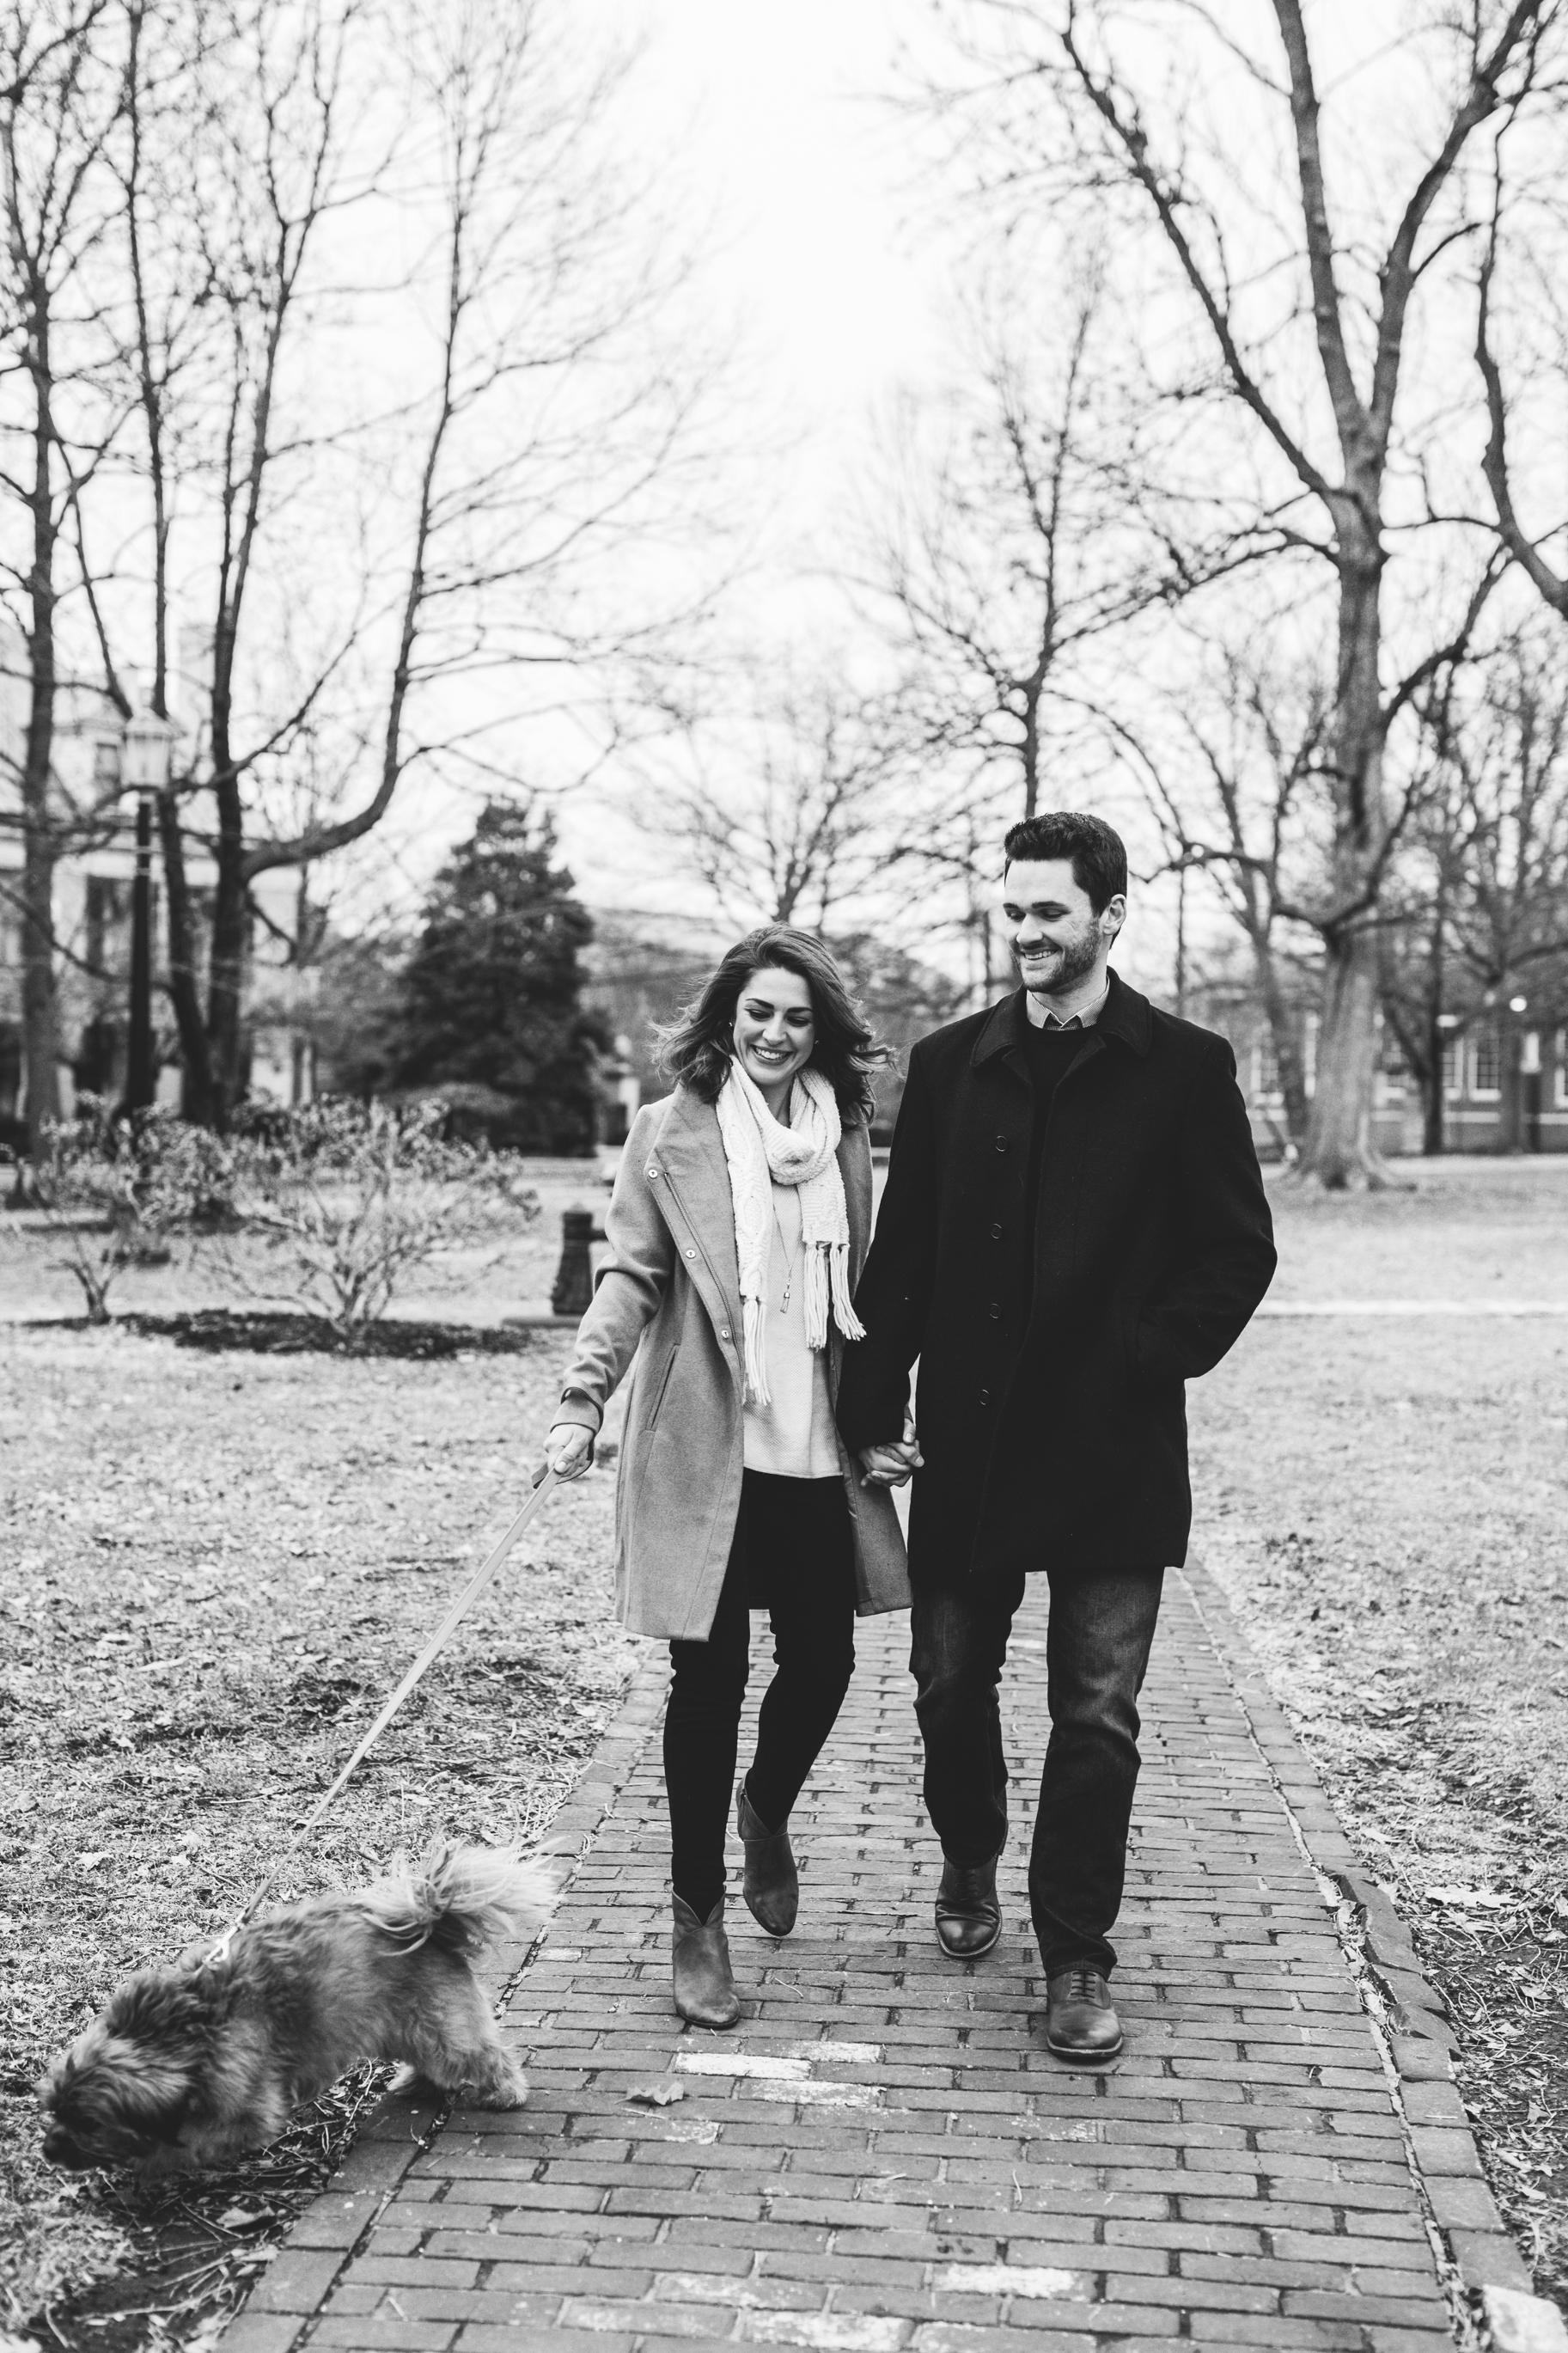 Ellen & Lee Engagement 2018 WEBSITE SP Crystal Ludwick Photo (34 of 54).jpg